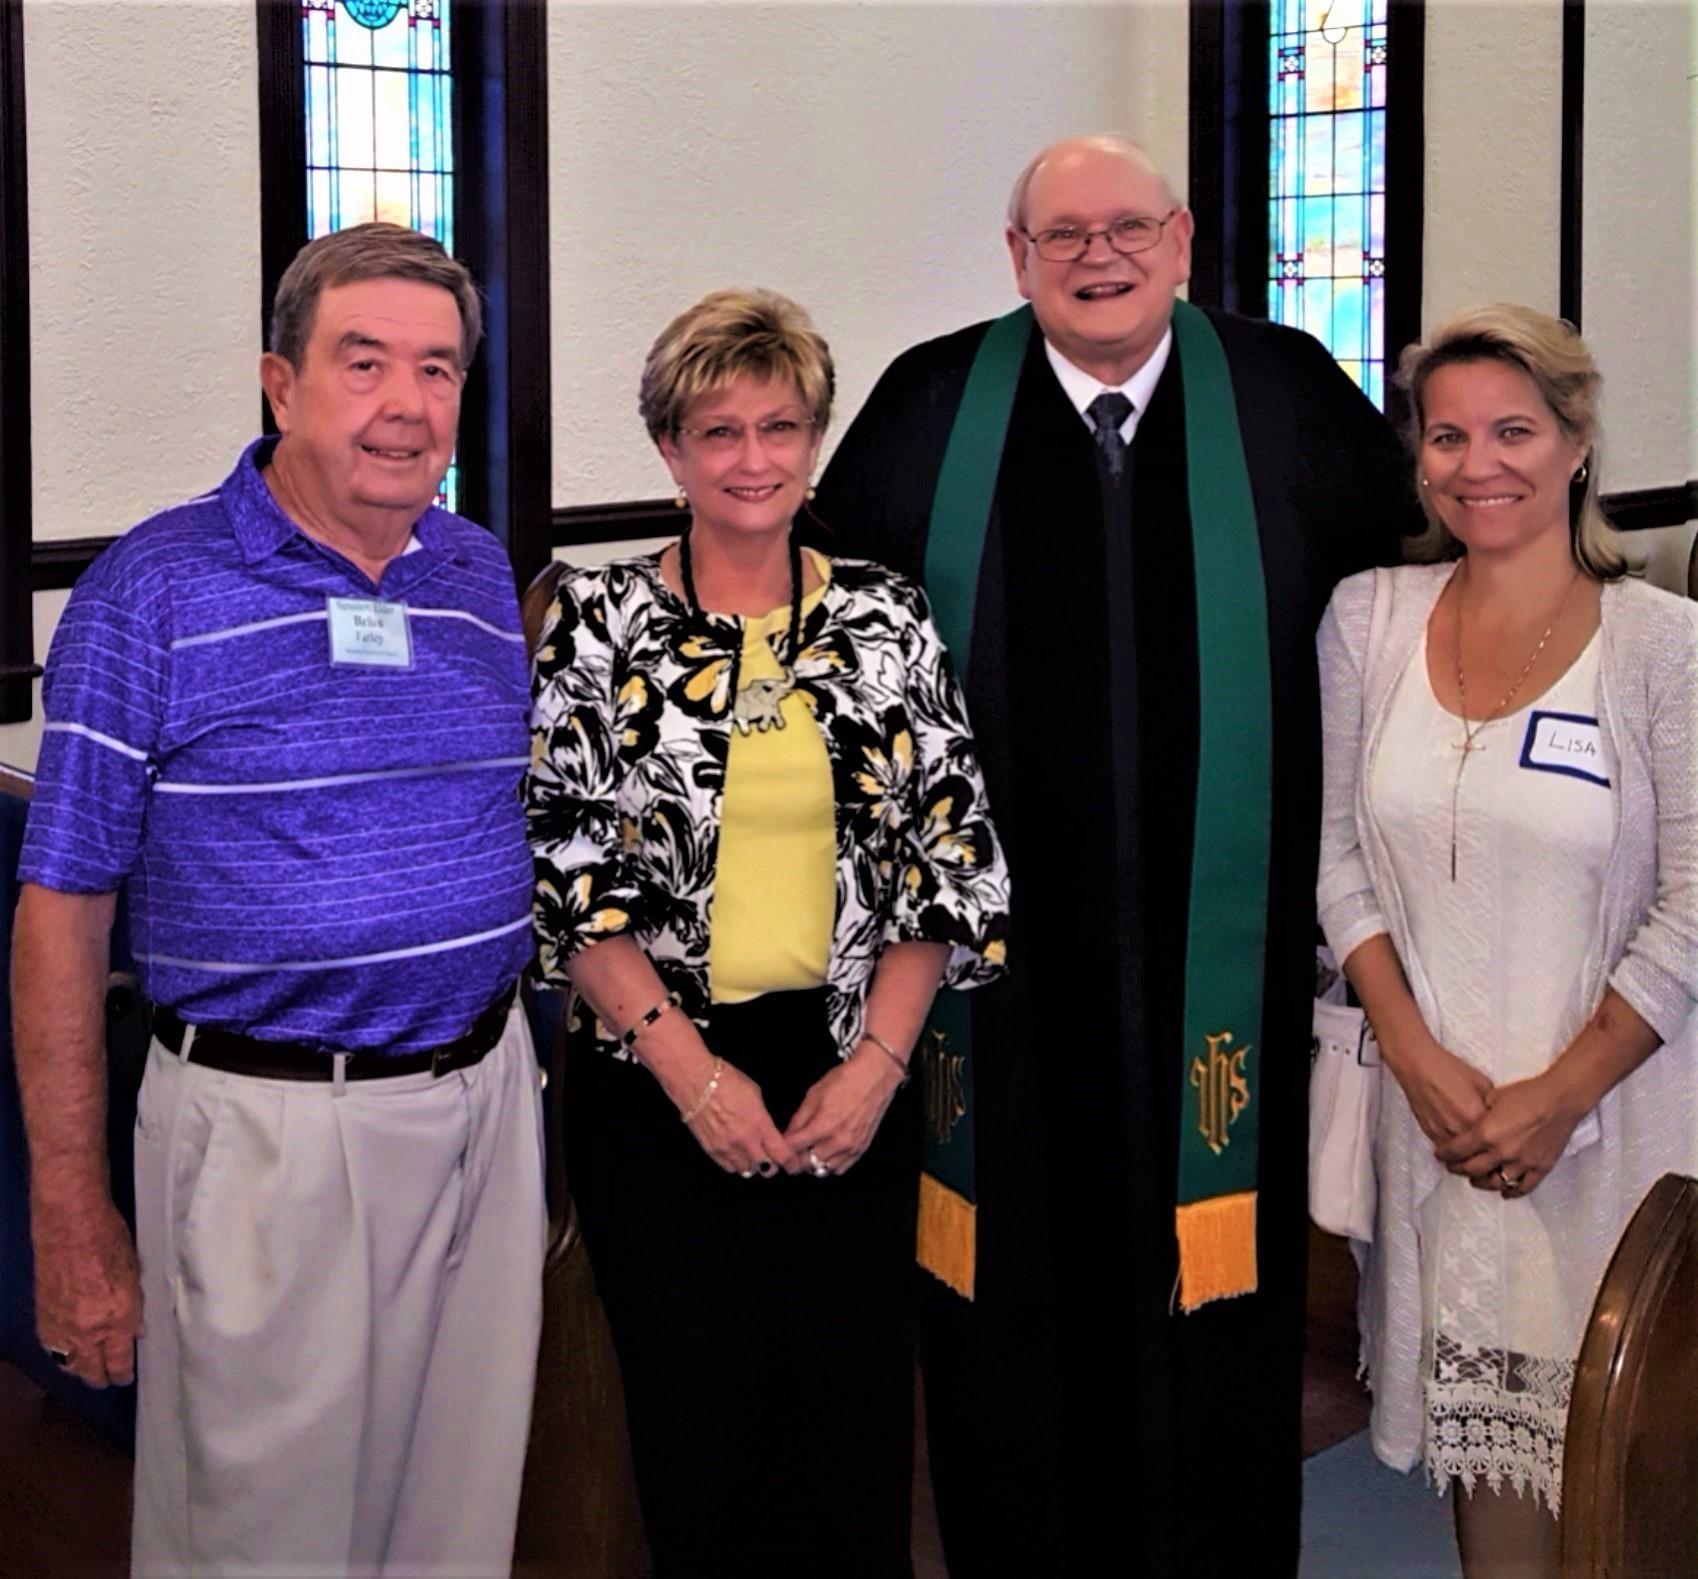 Pastor Laseter & Ellen, Brian Farley, Lisa habermehl